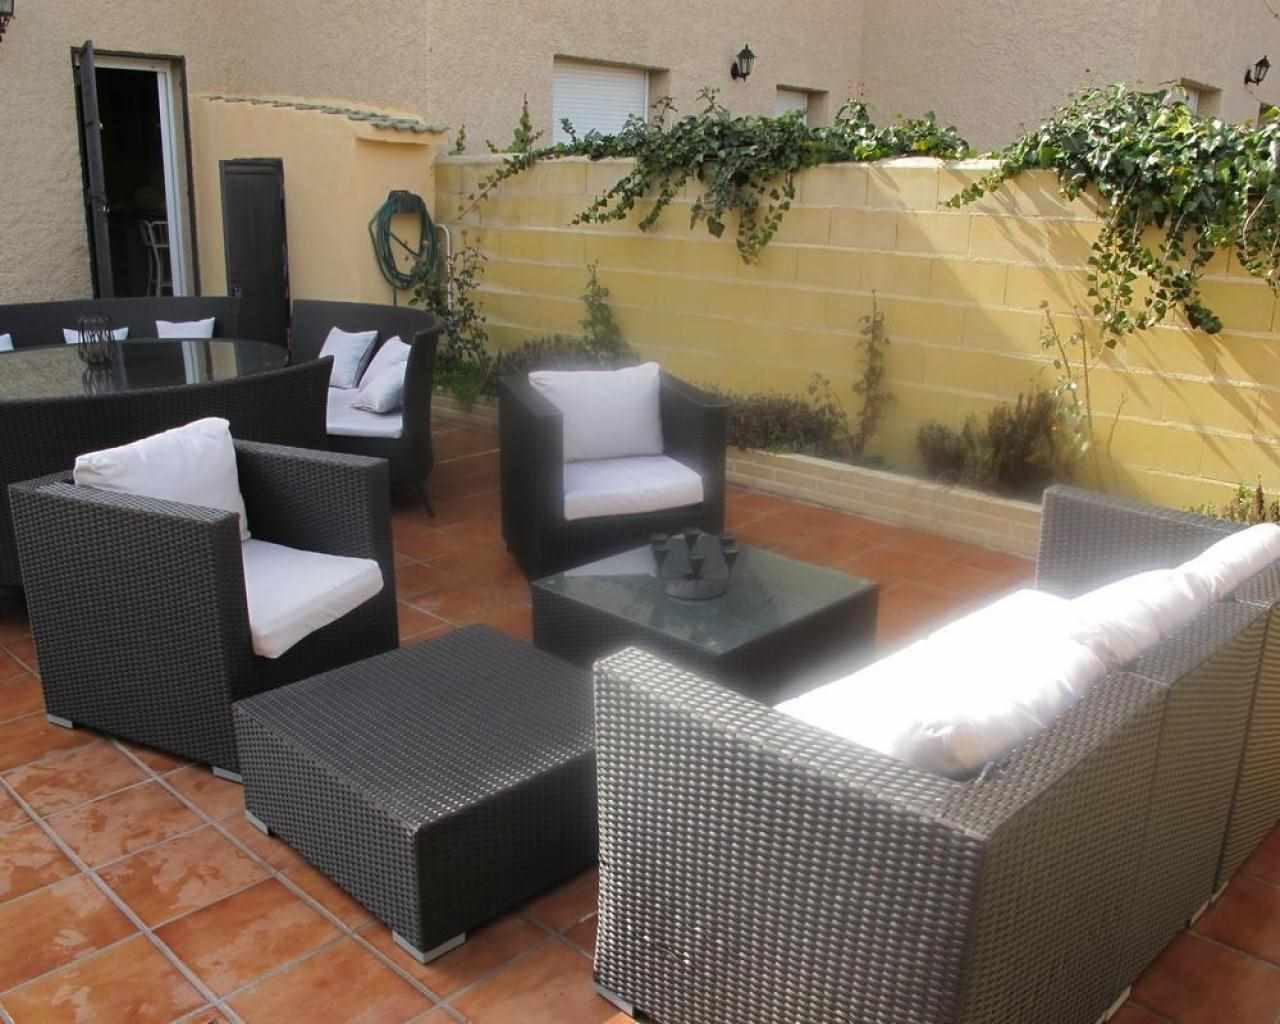 Alquiler de apartamentos Narrillos de San Leonardo, Ávila